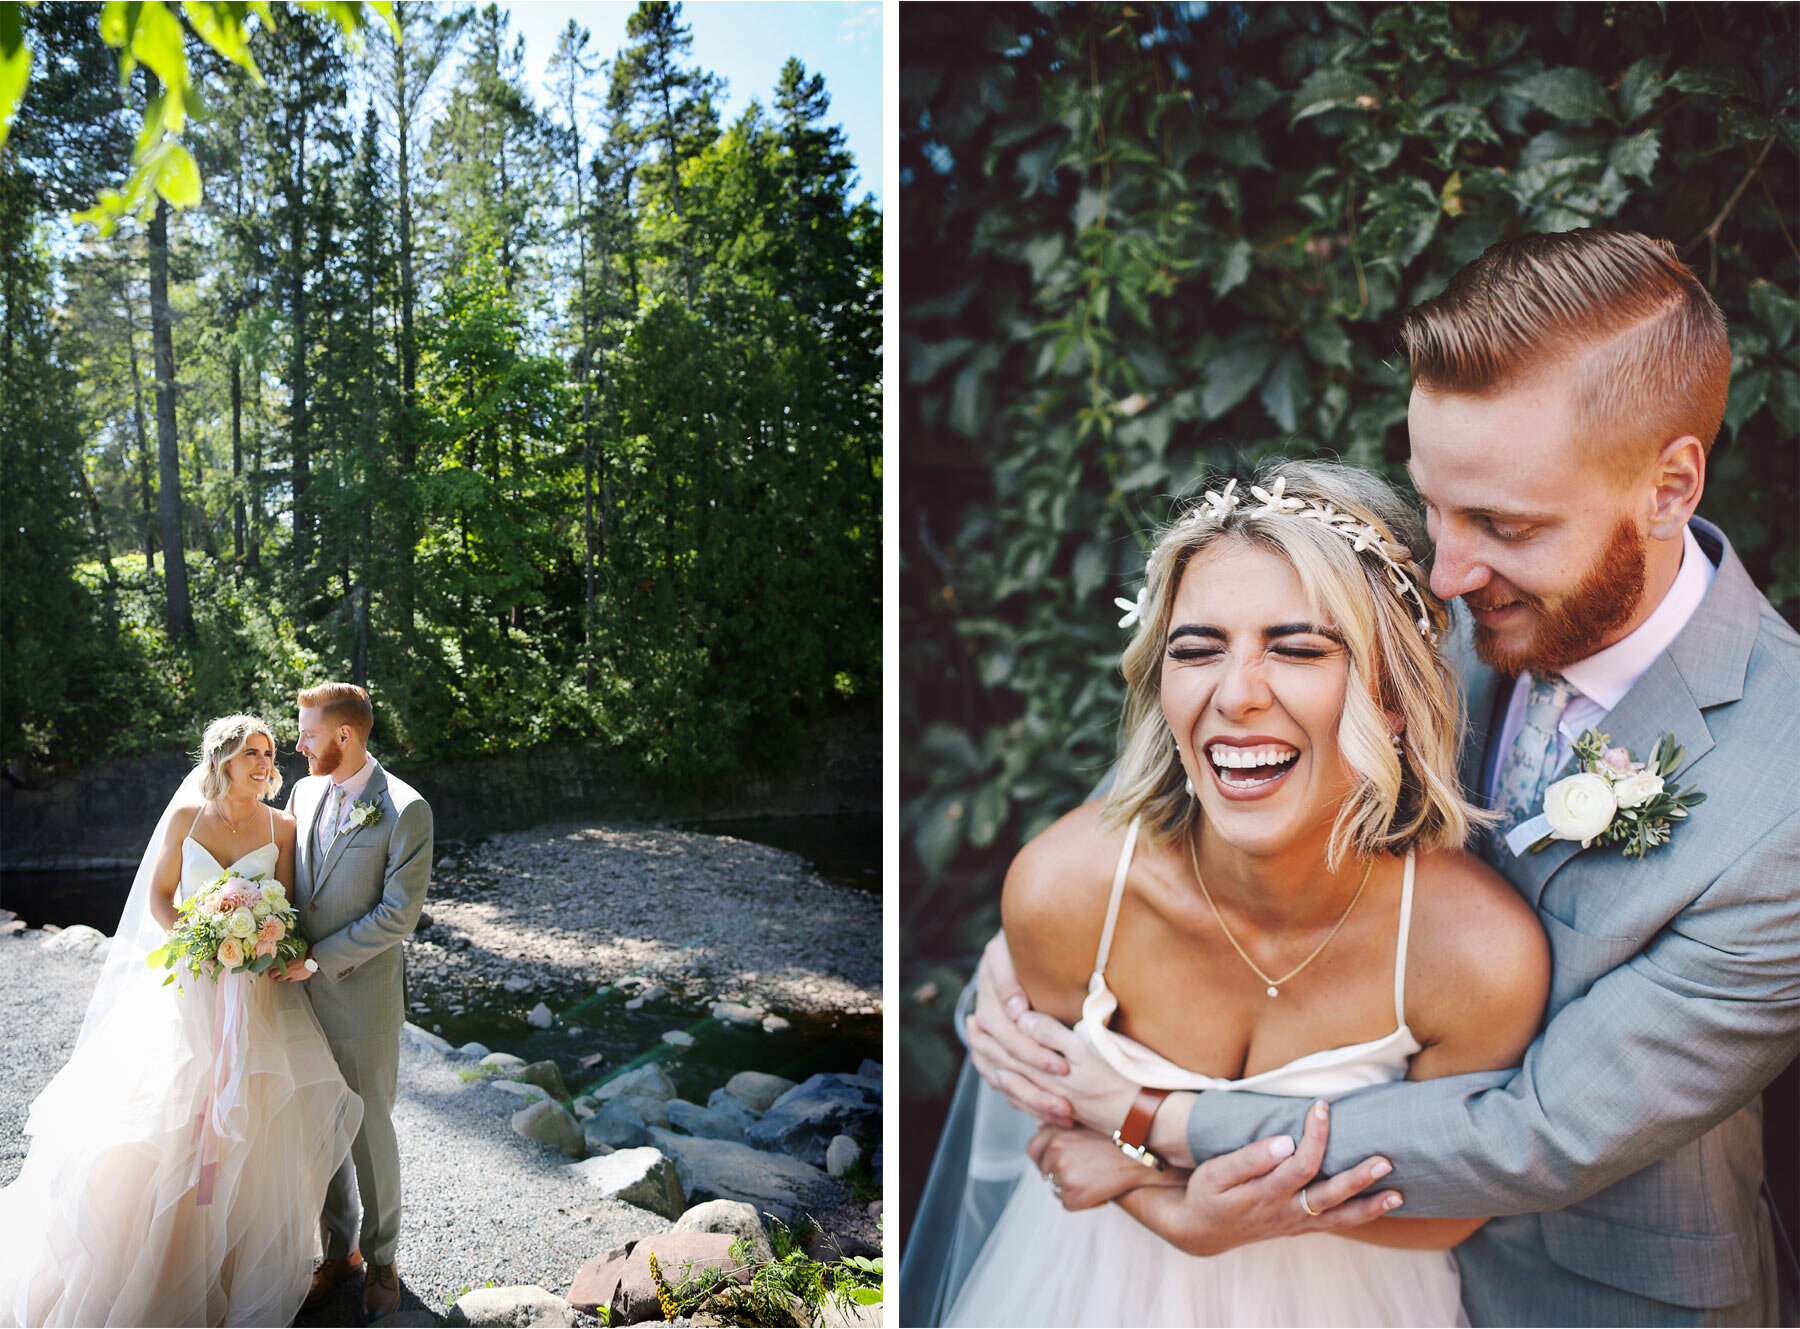 09-Vick-Photography-Wedding-Duluth-Minnesota-Glensheen-Mansion-Groom-Bride-Laughing-Catherine-and-John.jpg